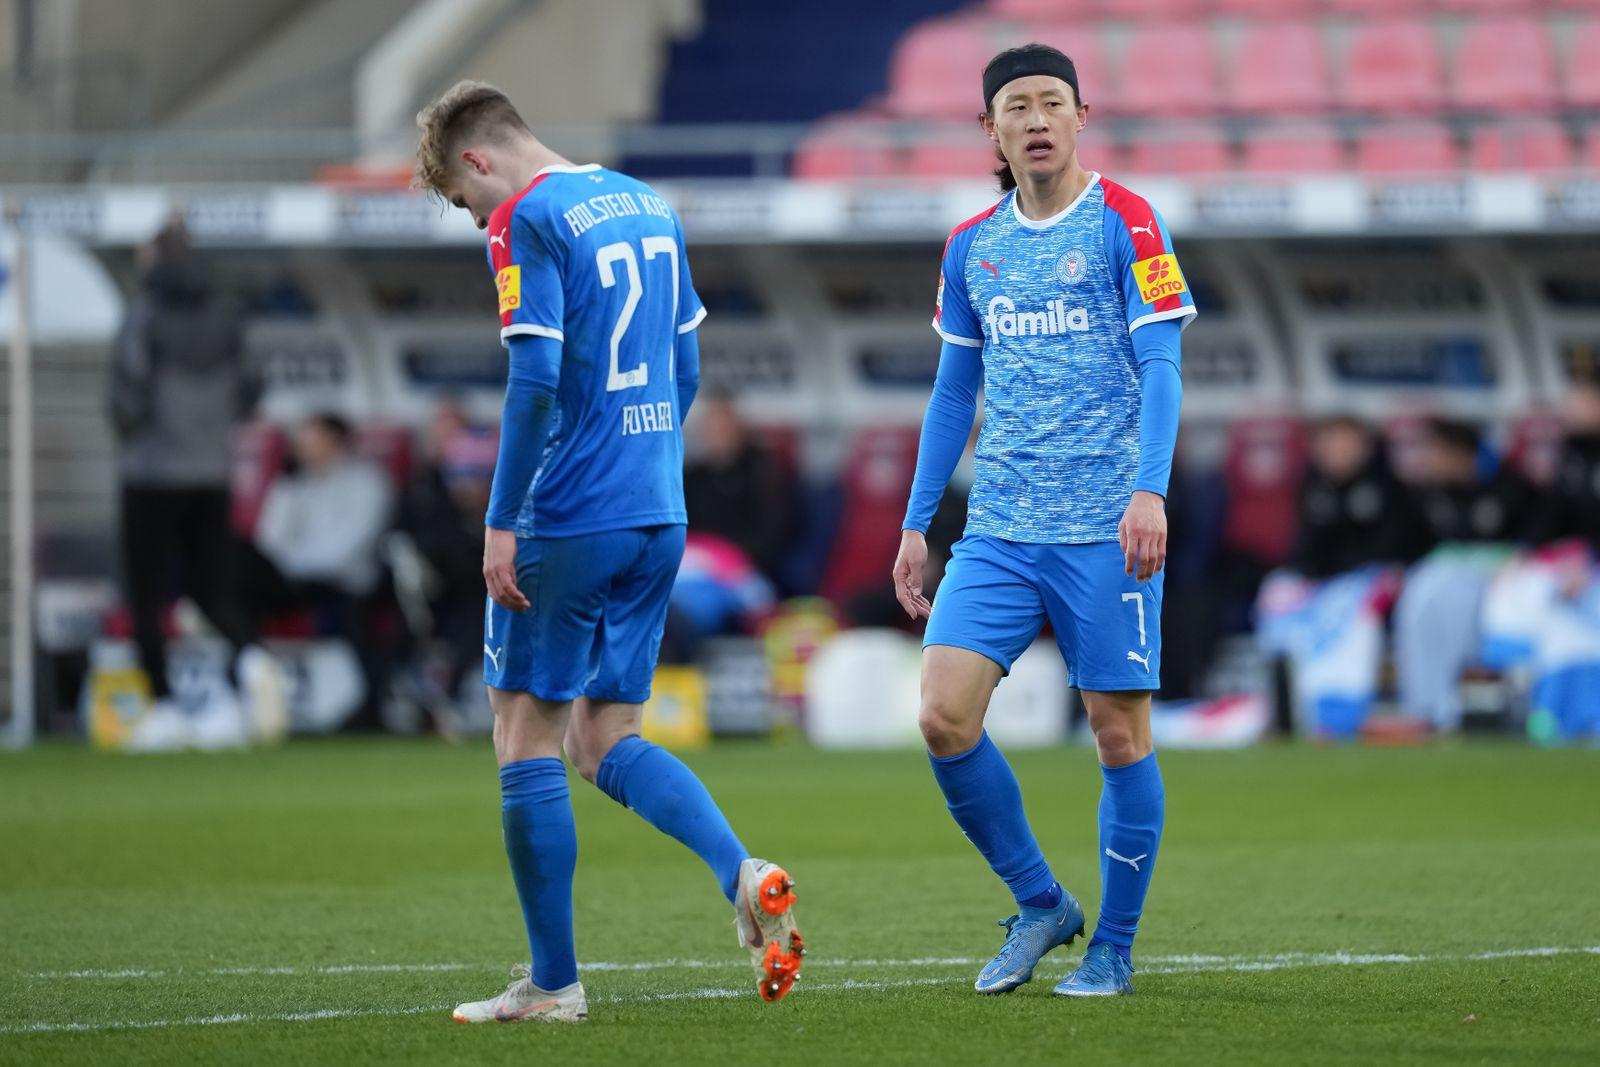 1. FC Heidenheim 1846 v Holstein Kiel - Second Bundesliga